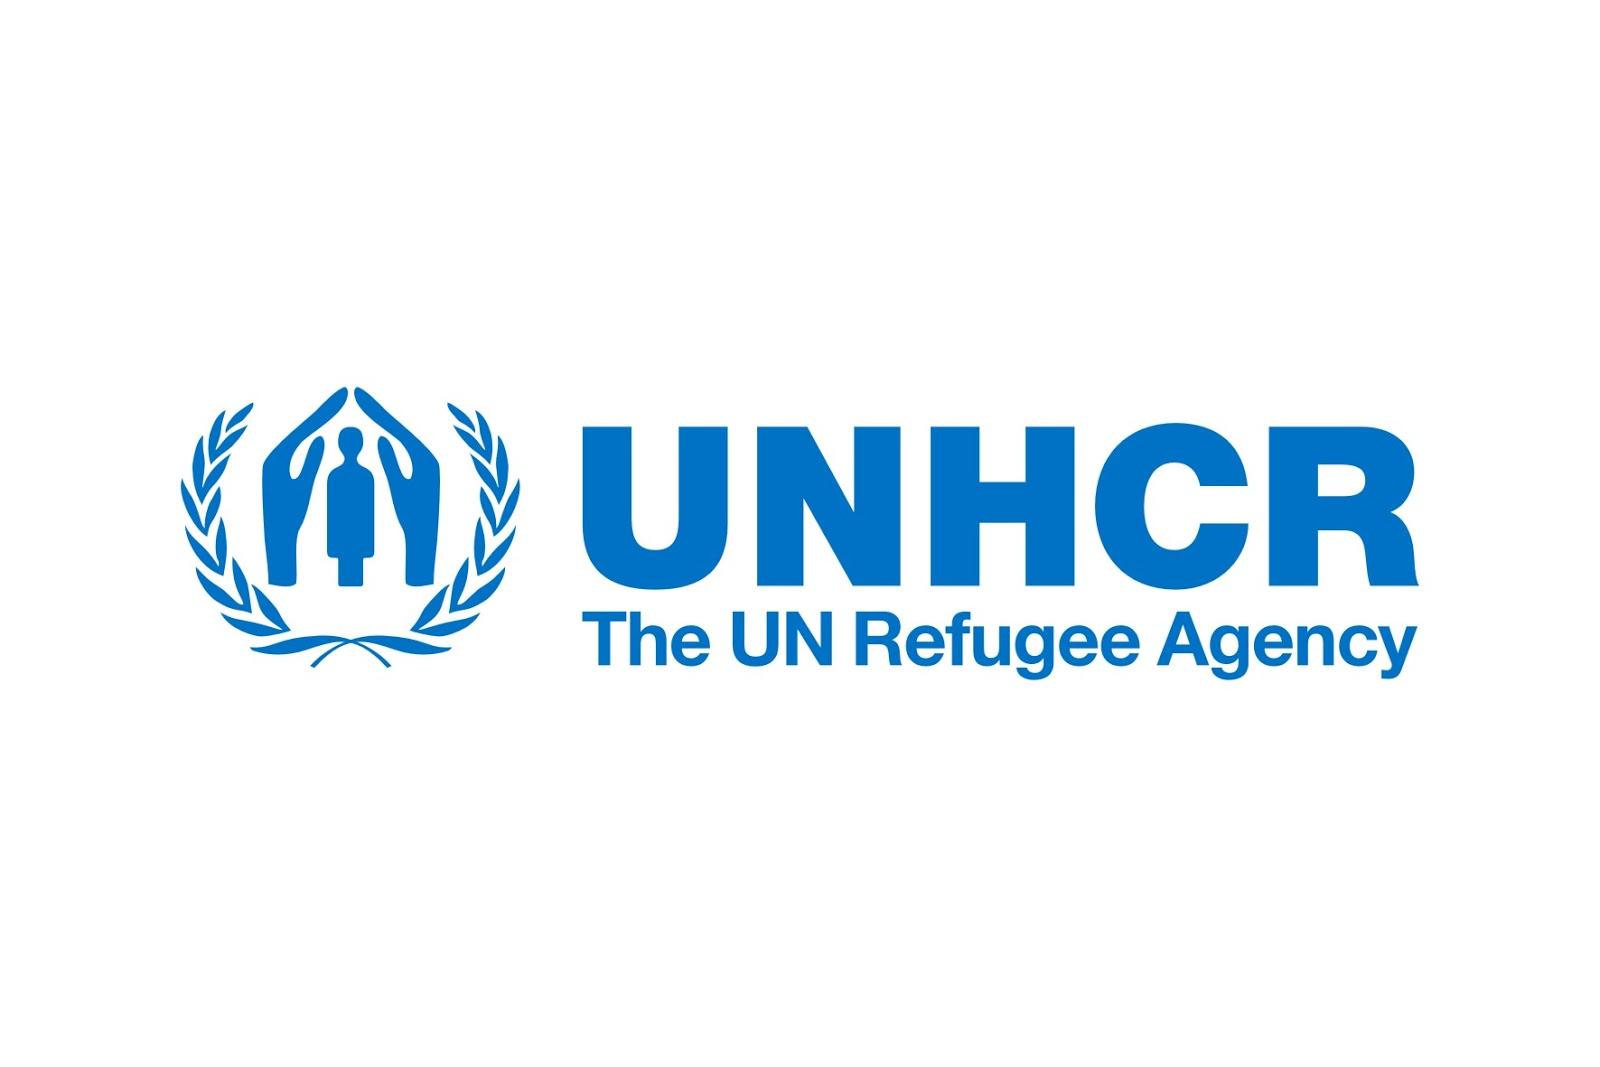 UNHCR_Filippo Grandi_Yüksek Komiser